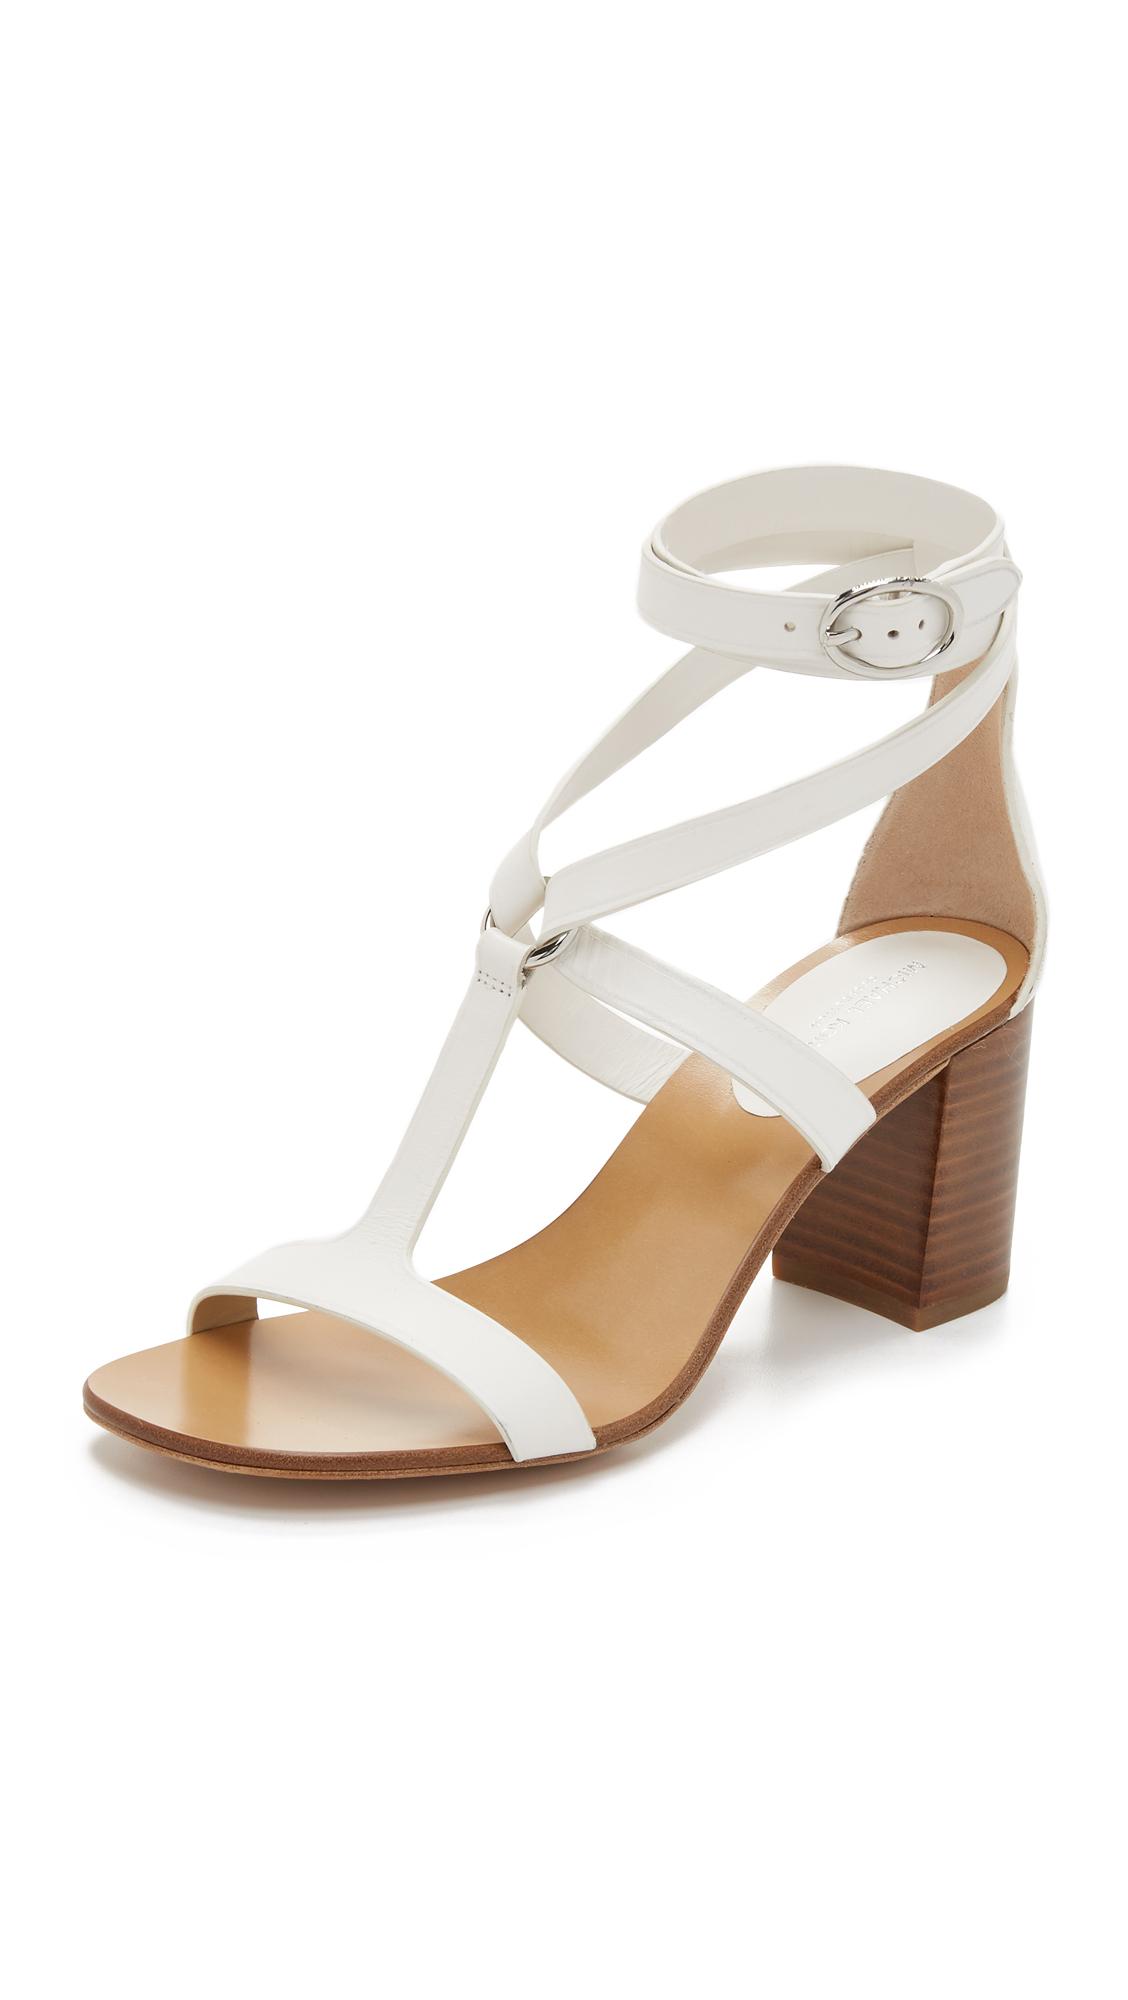 Michael kors Ellison City Sandals in White | Lyst